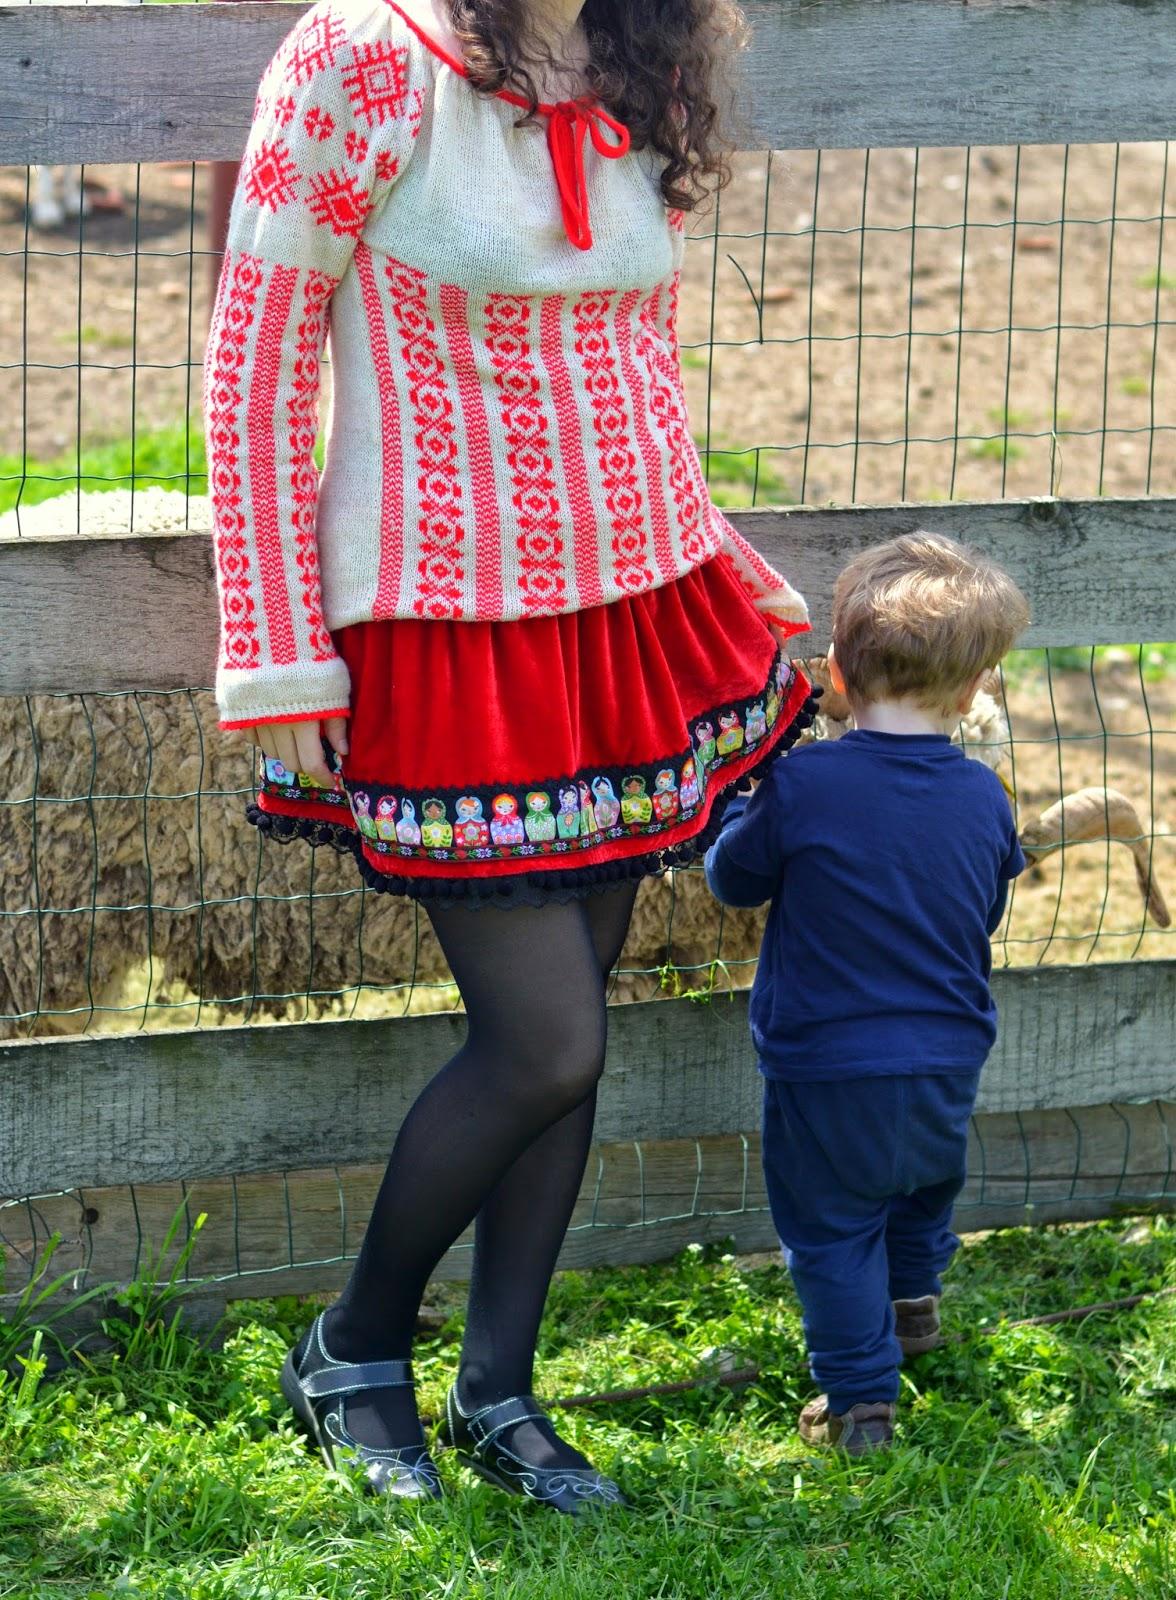 lace tape, matryoshka doll, pom poms tape, red velvet, ribbons applique, skirt, lace hem, ie traditinala romaneasca tricotata